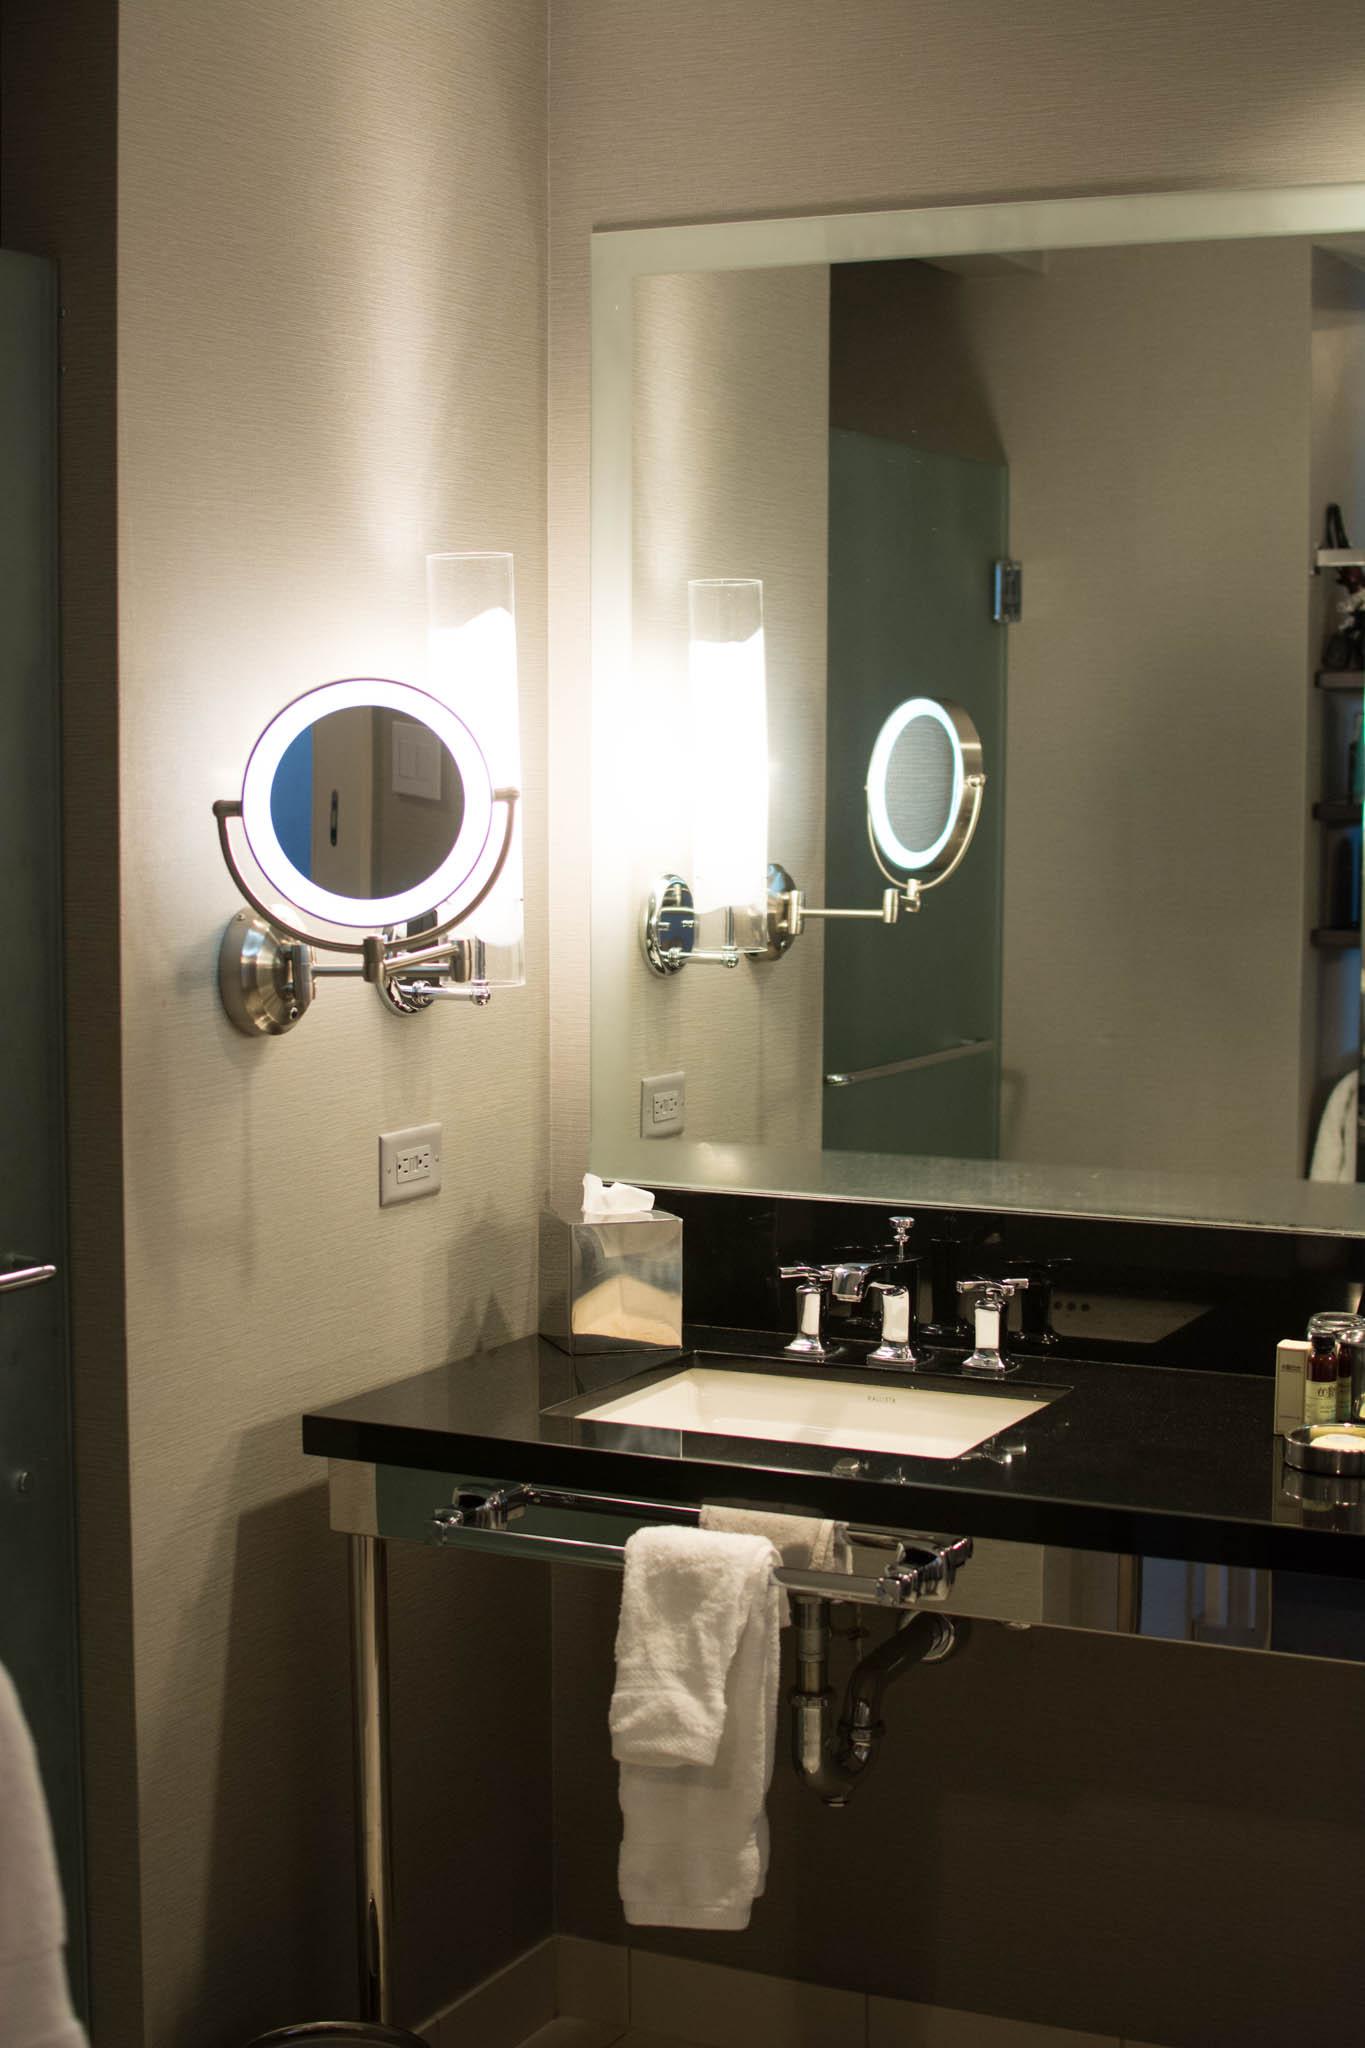 Bathroom Sinks Las Vegas the cosmopolitan hotel las vegas review - flashes of delight